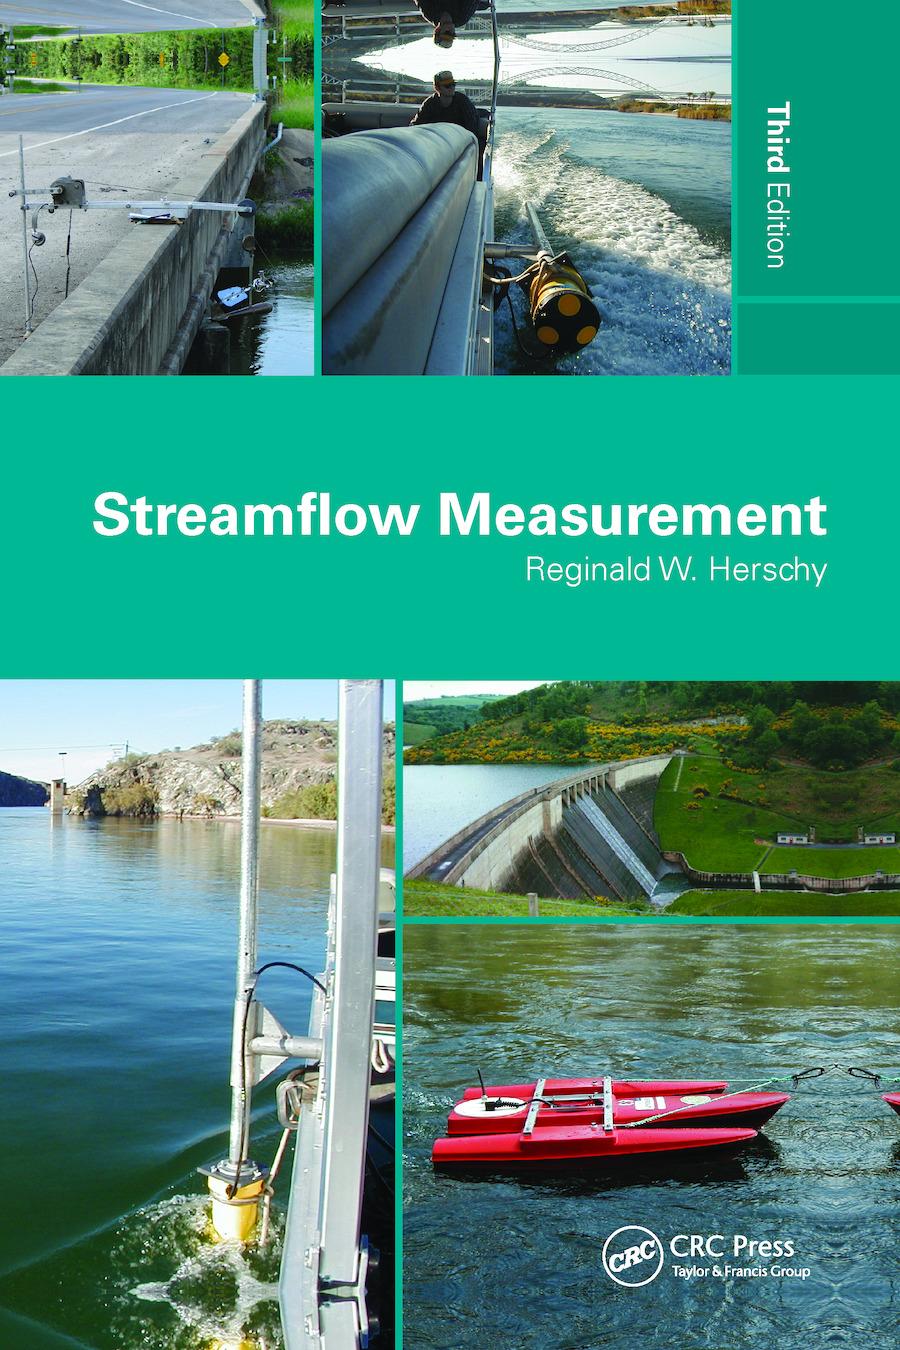 Streamflow Measurement book cover